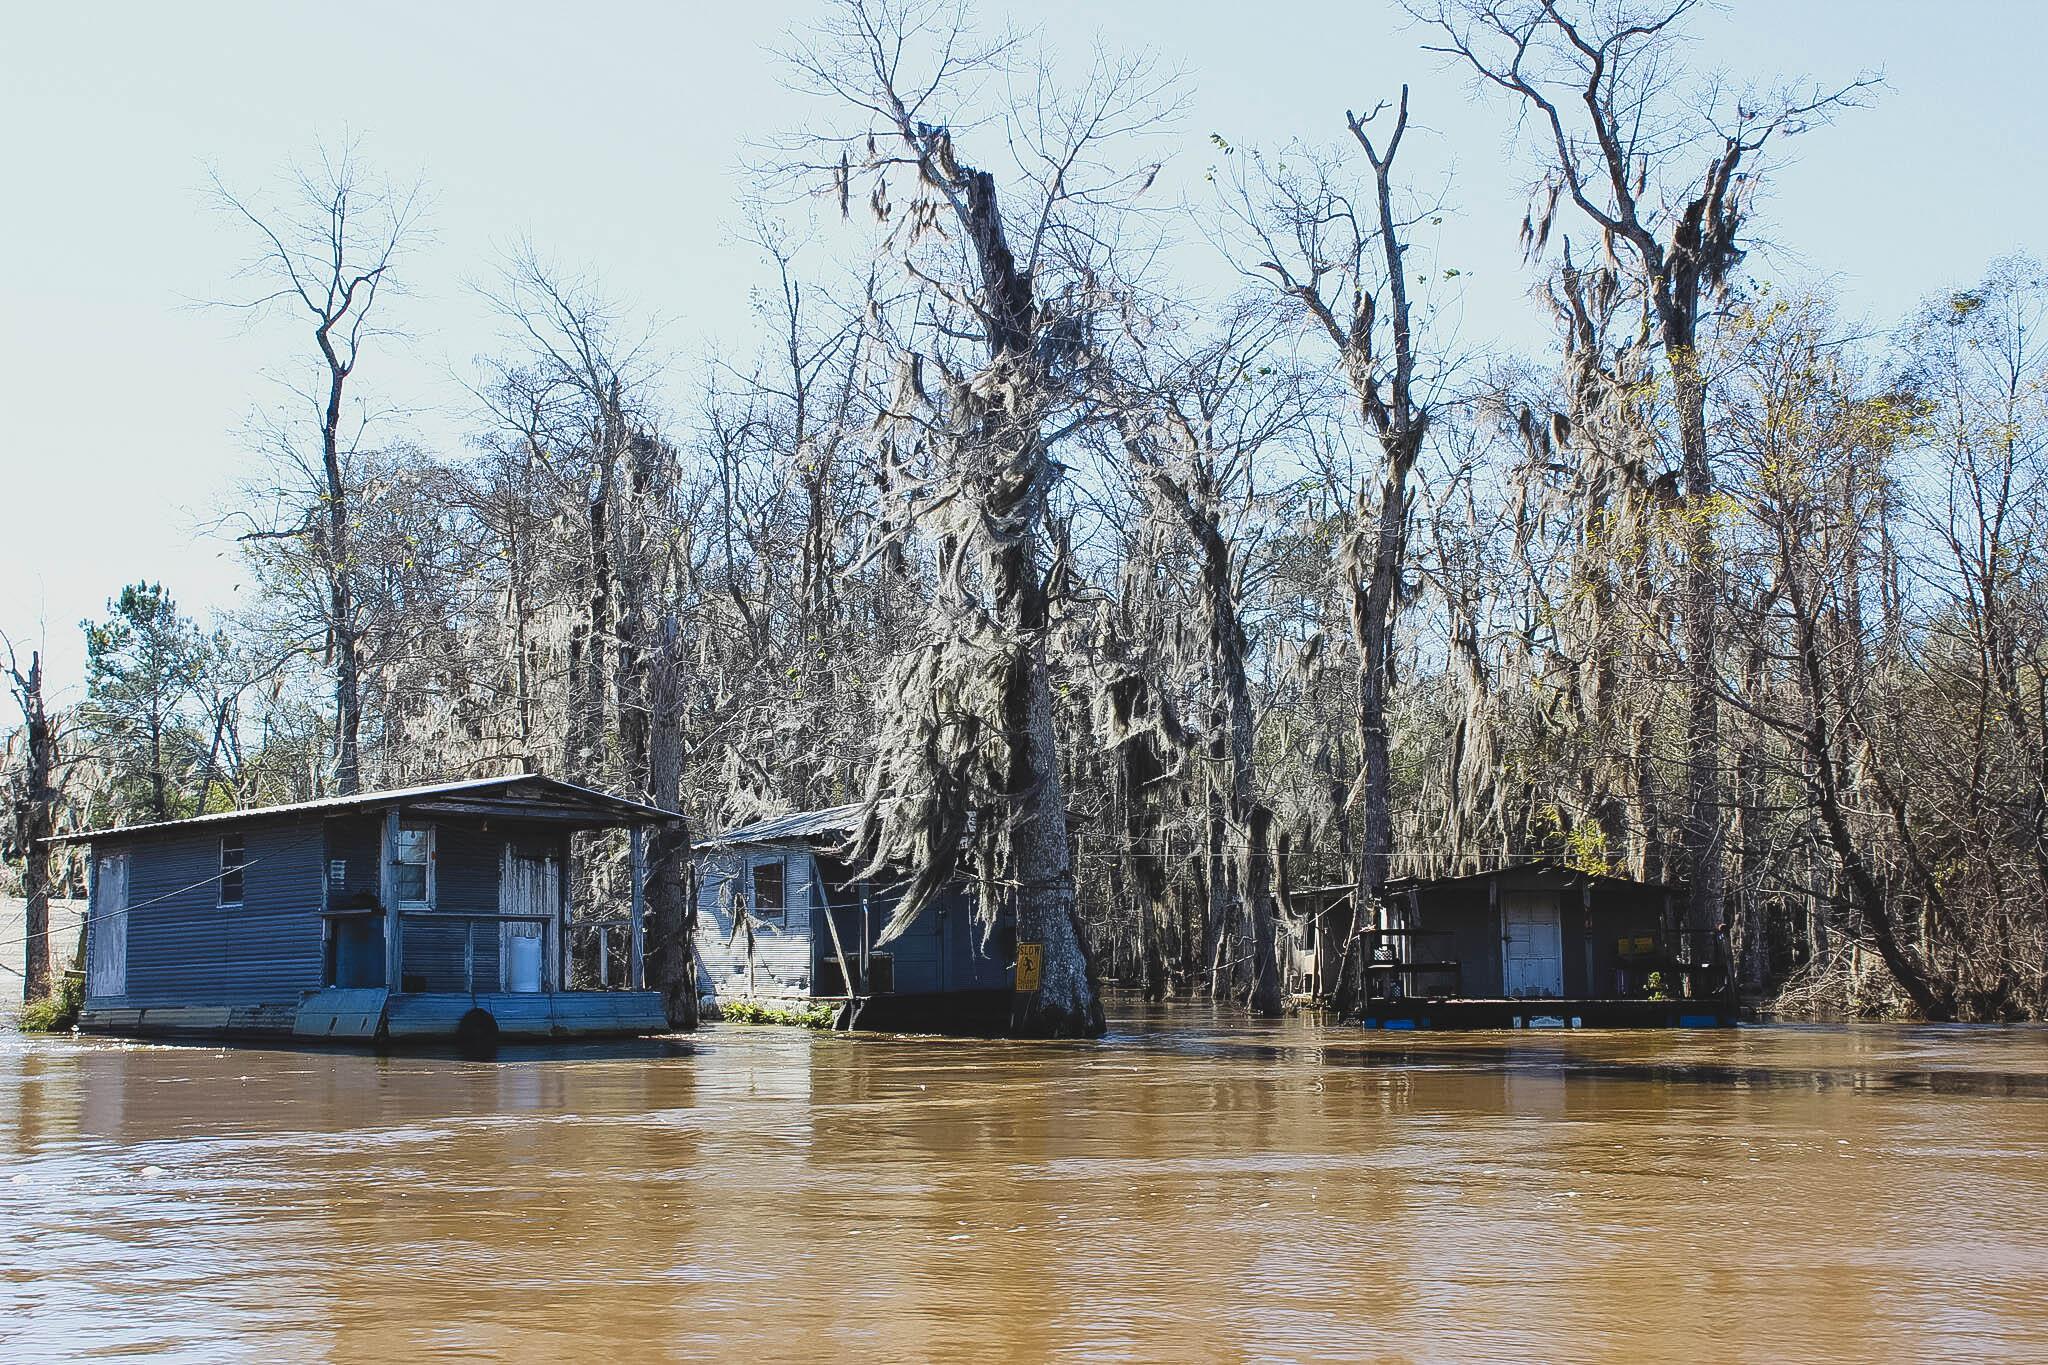 honey island swamp : ouiwegirl.com